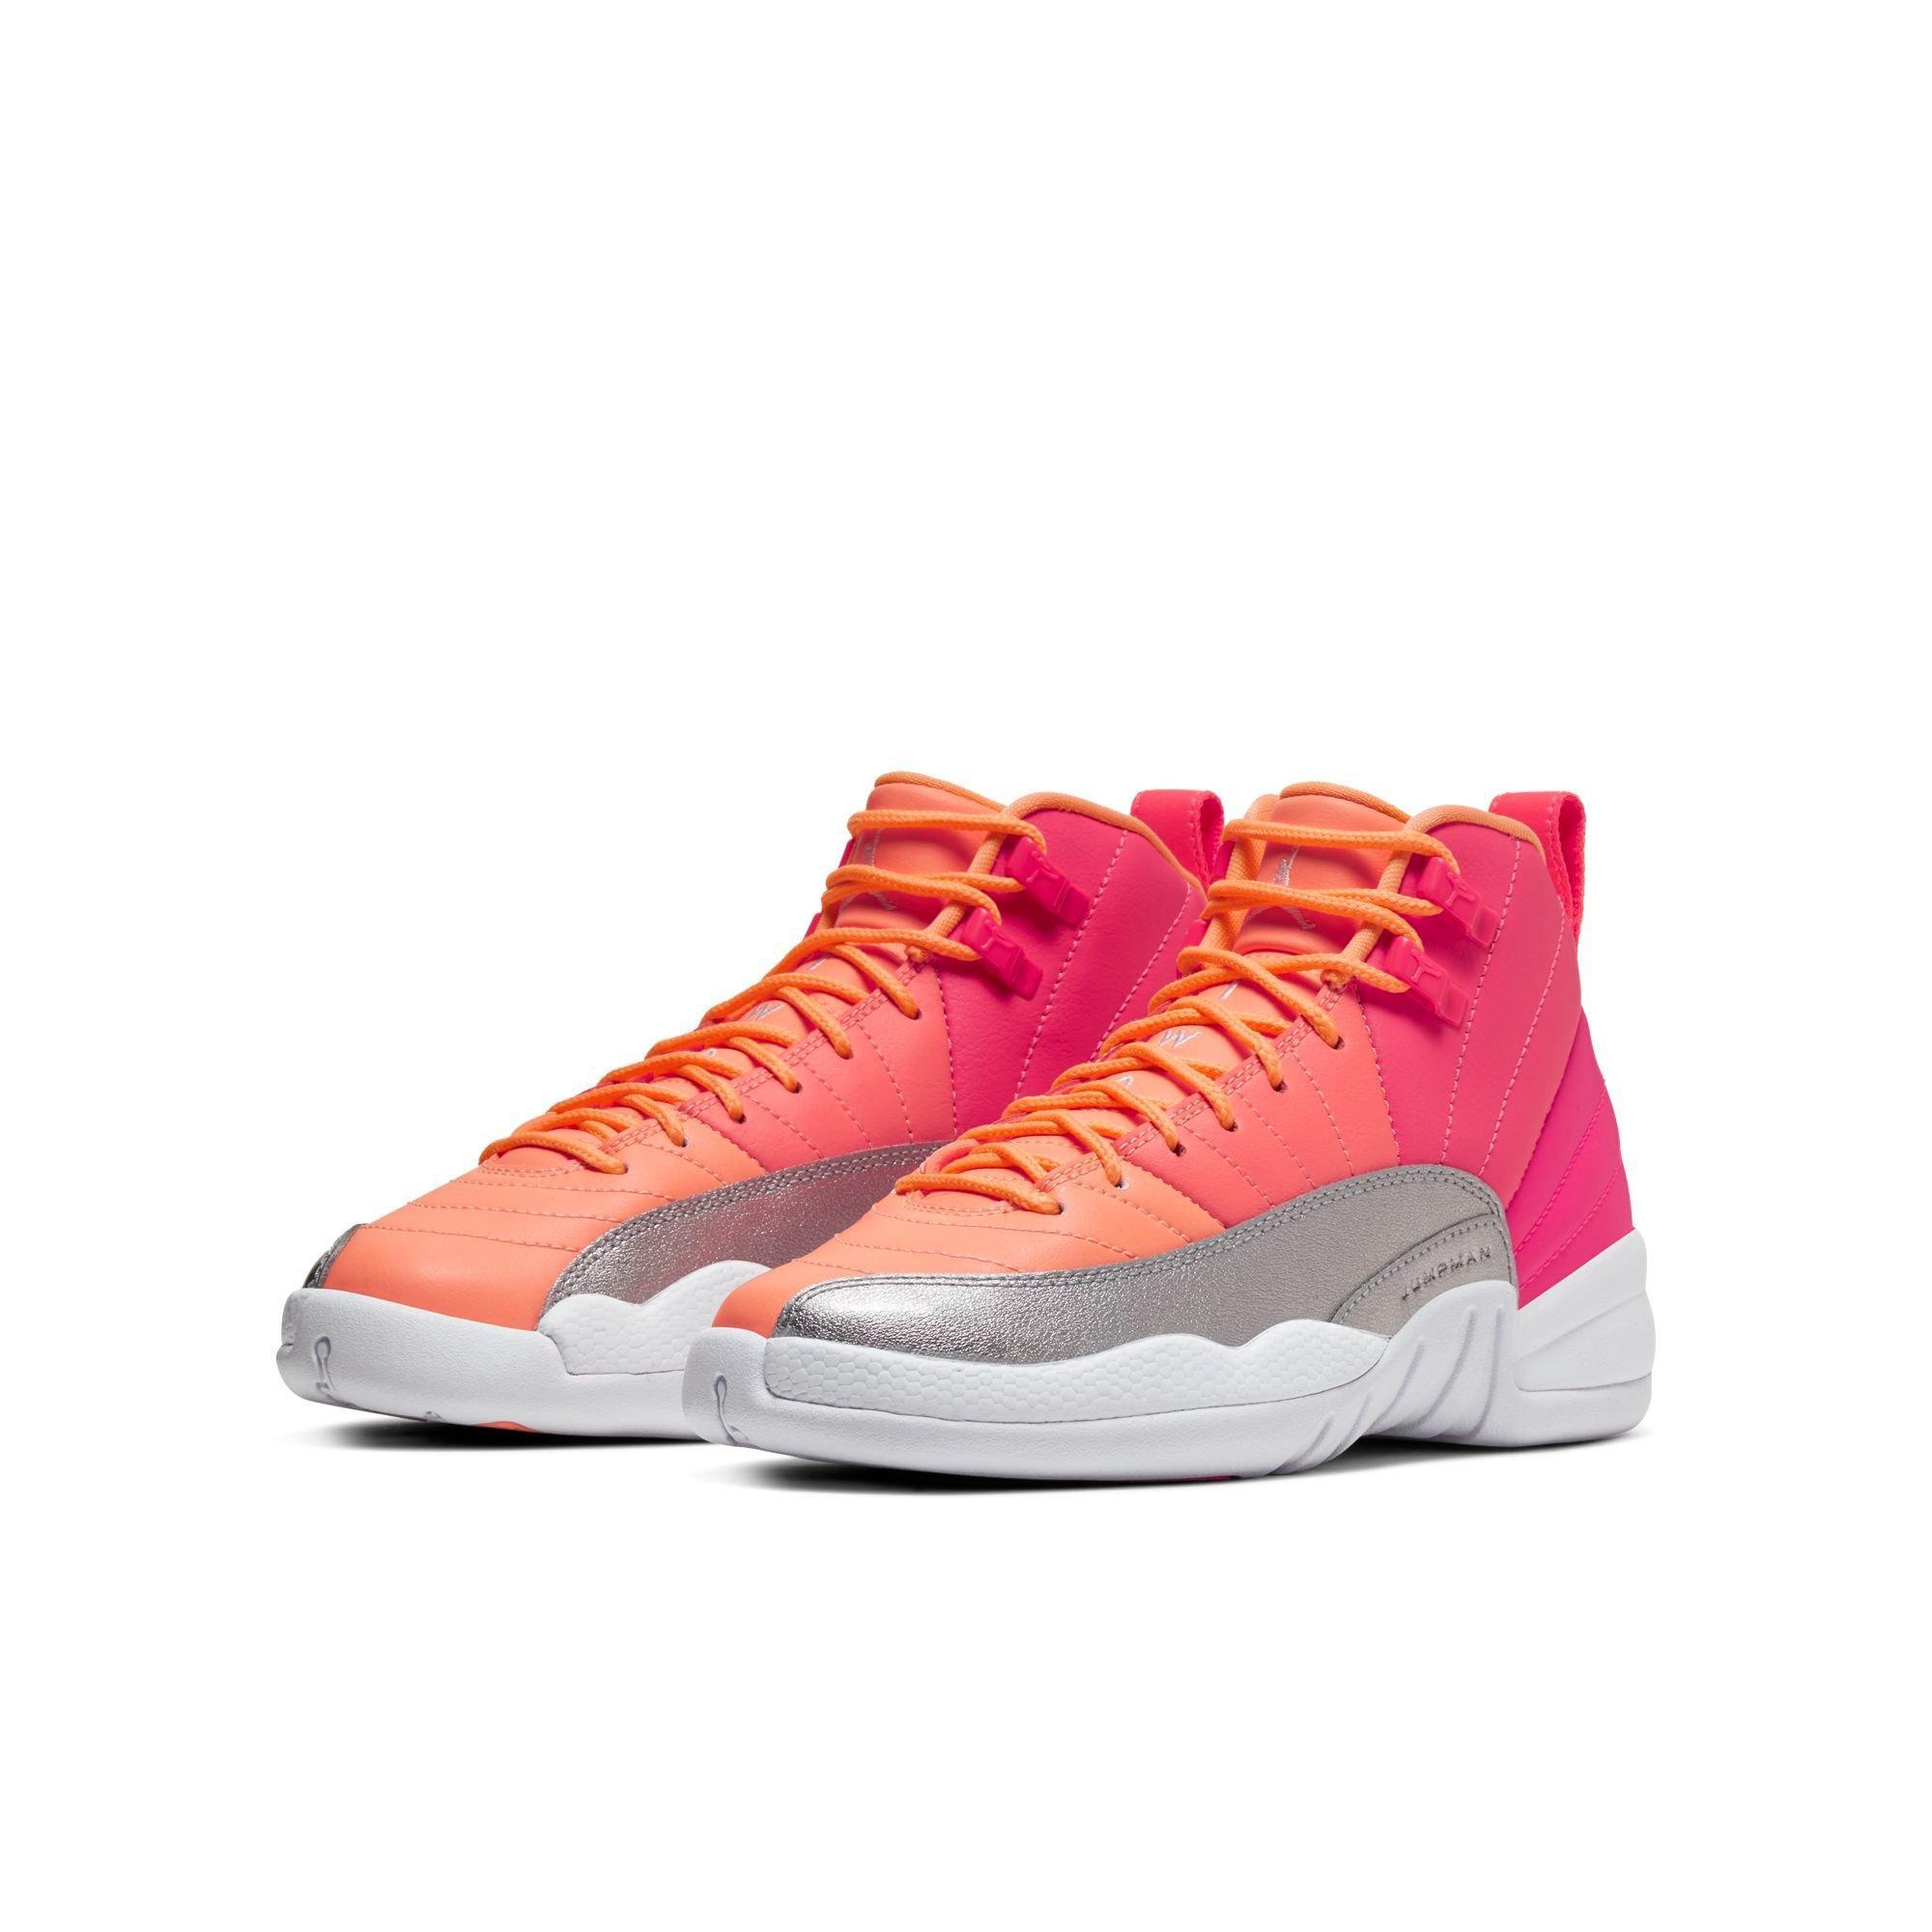 "Sneakers Release   Jordan Retro 12 ""Racer Pink/White/Hot Punch"